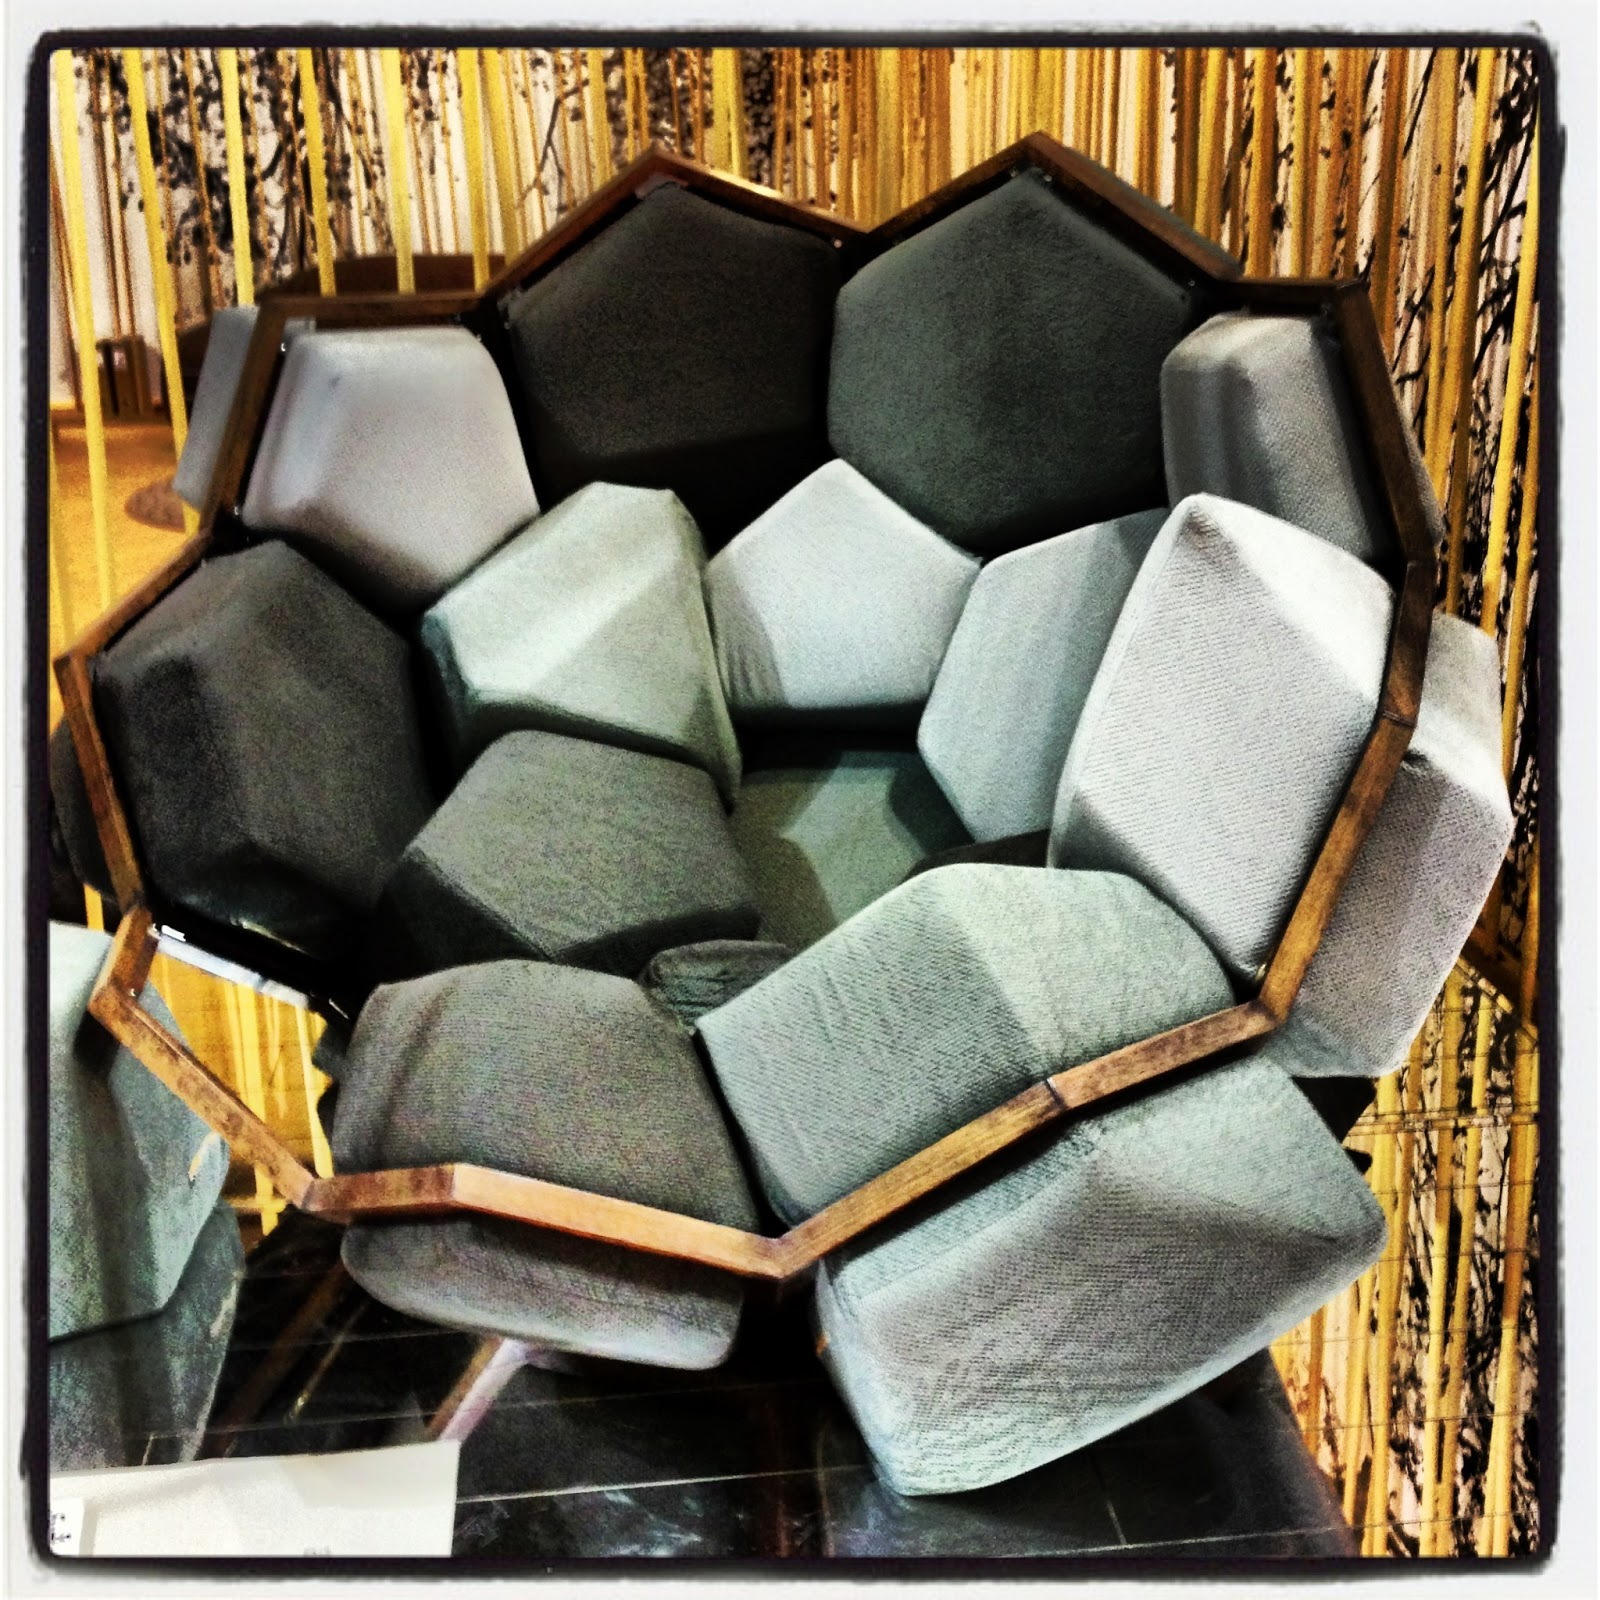 Feria del mueble de mil n 2013 - Feria del mueble milan ...